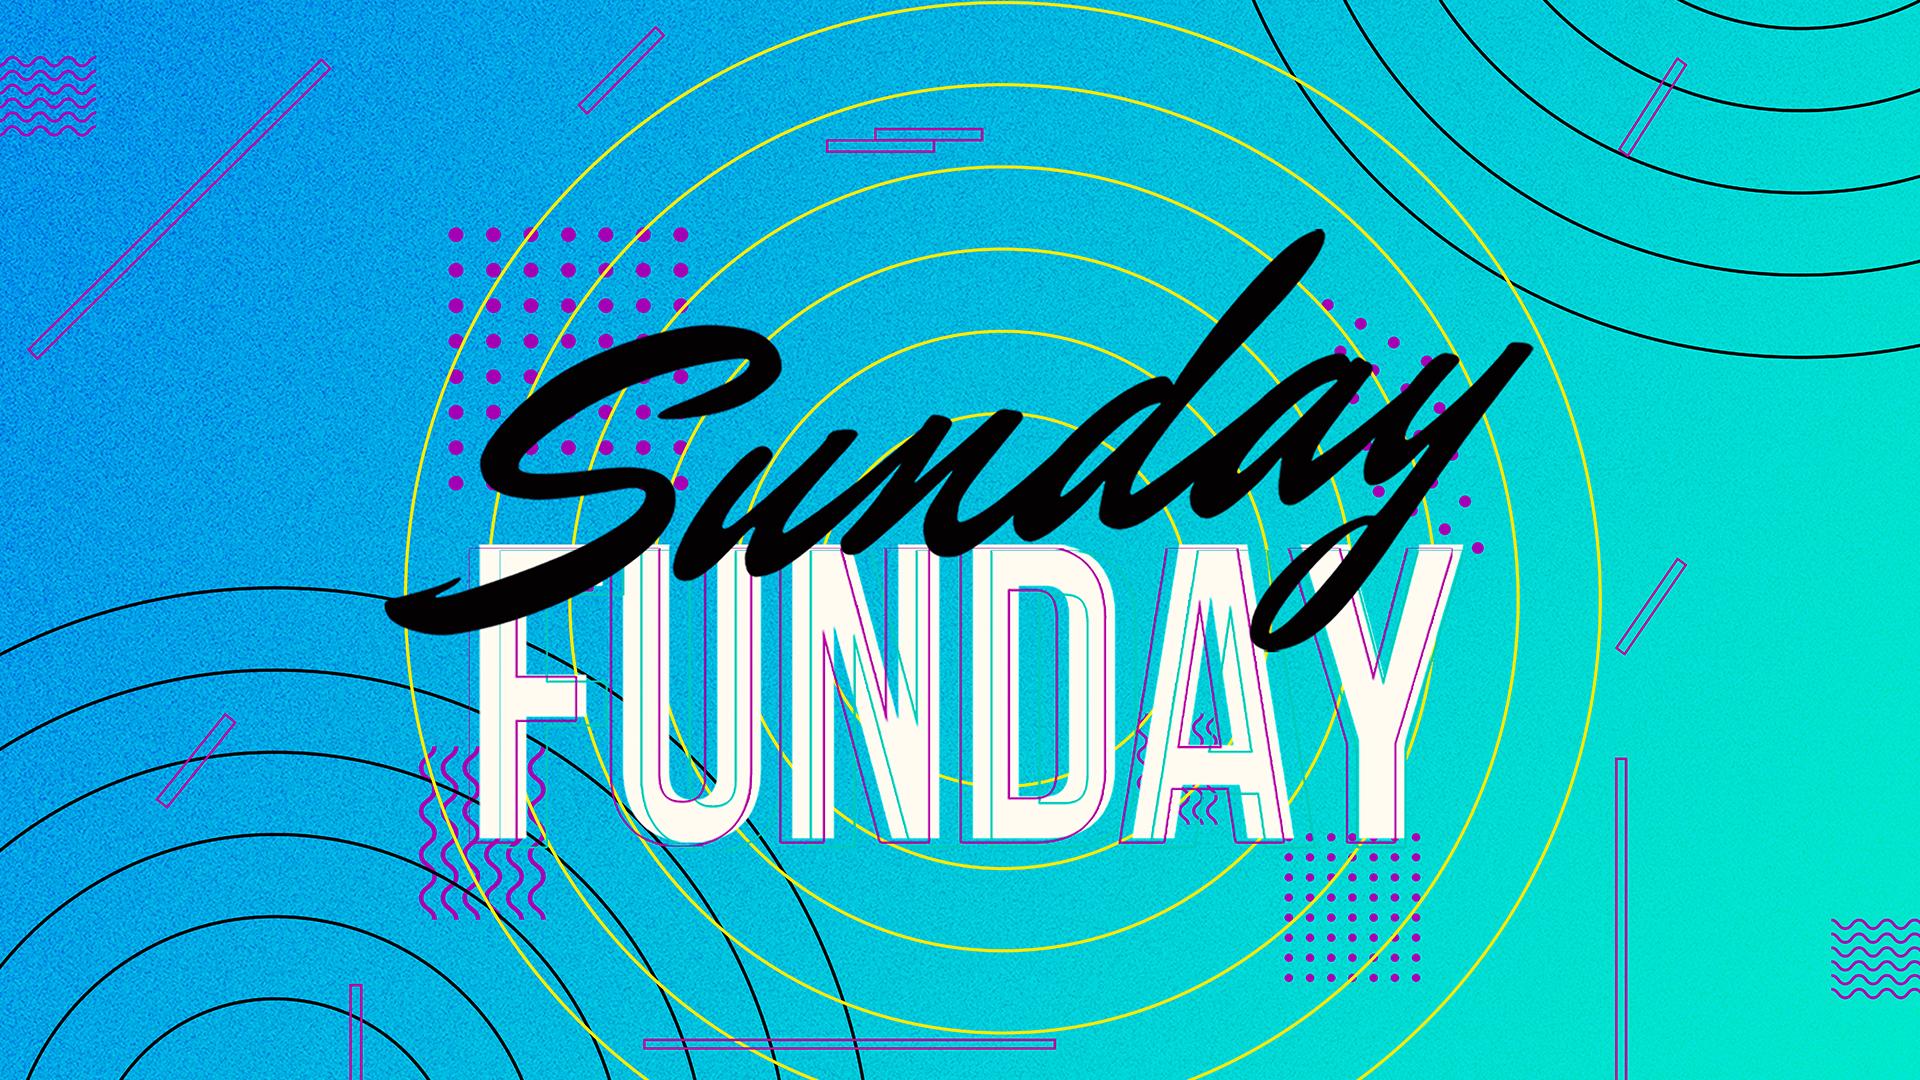 Sunday Funday_1920x1080.jpg